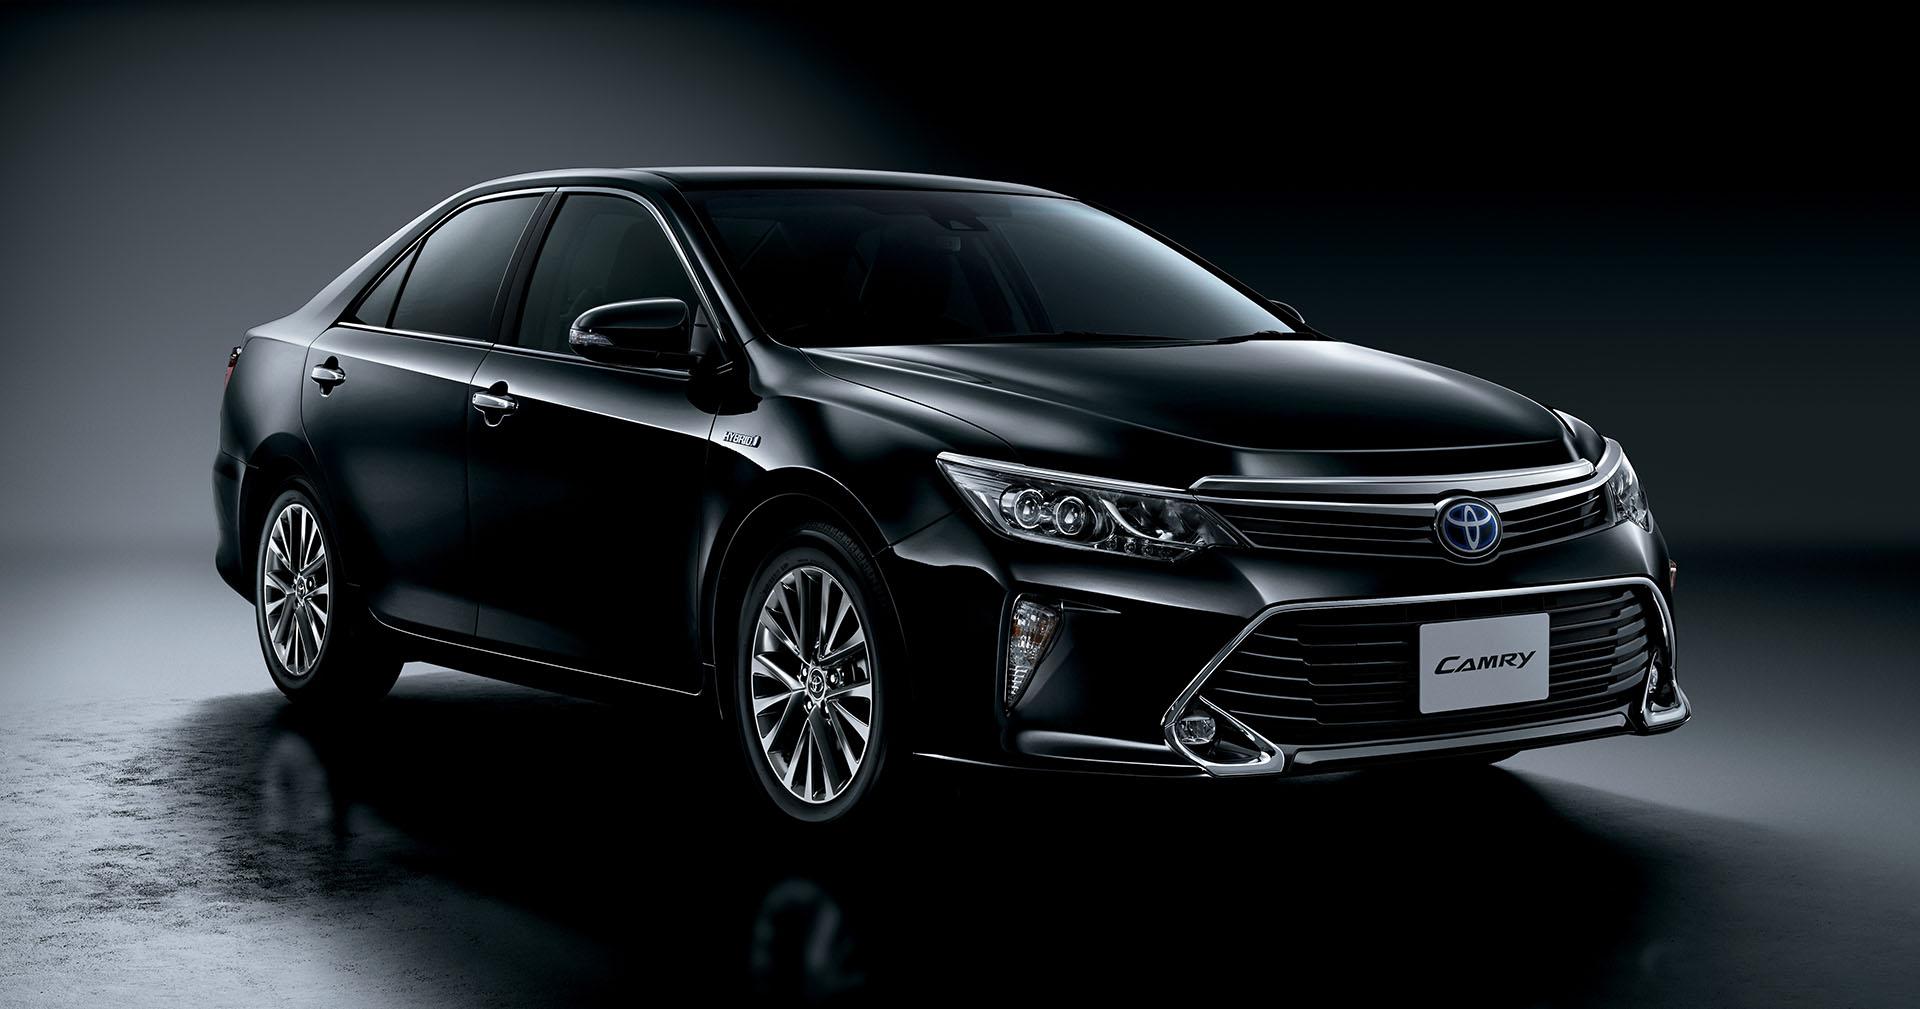 2015 Toyota Camry Gets LED Headlights and Woodgrain Trim